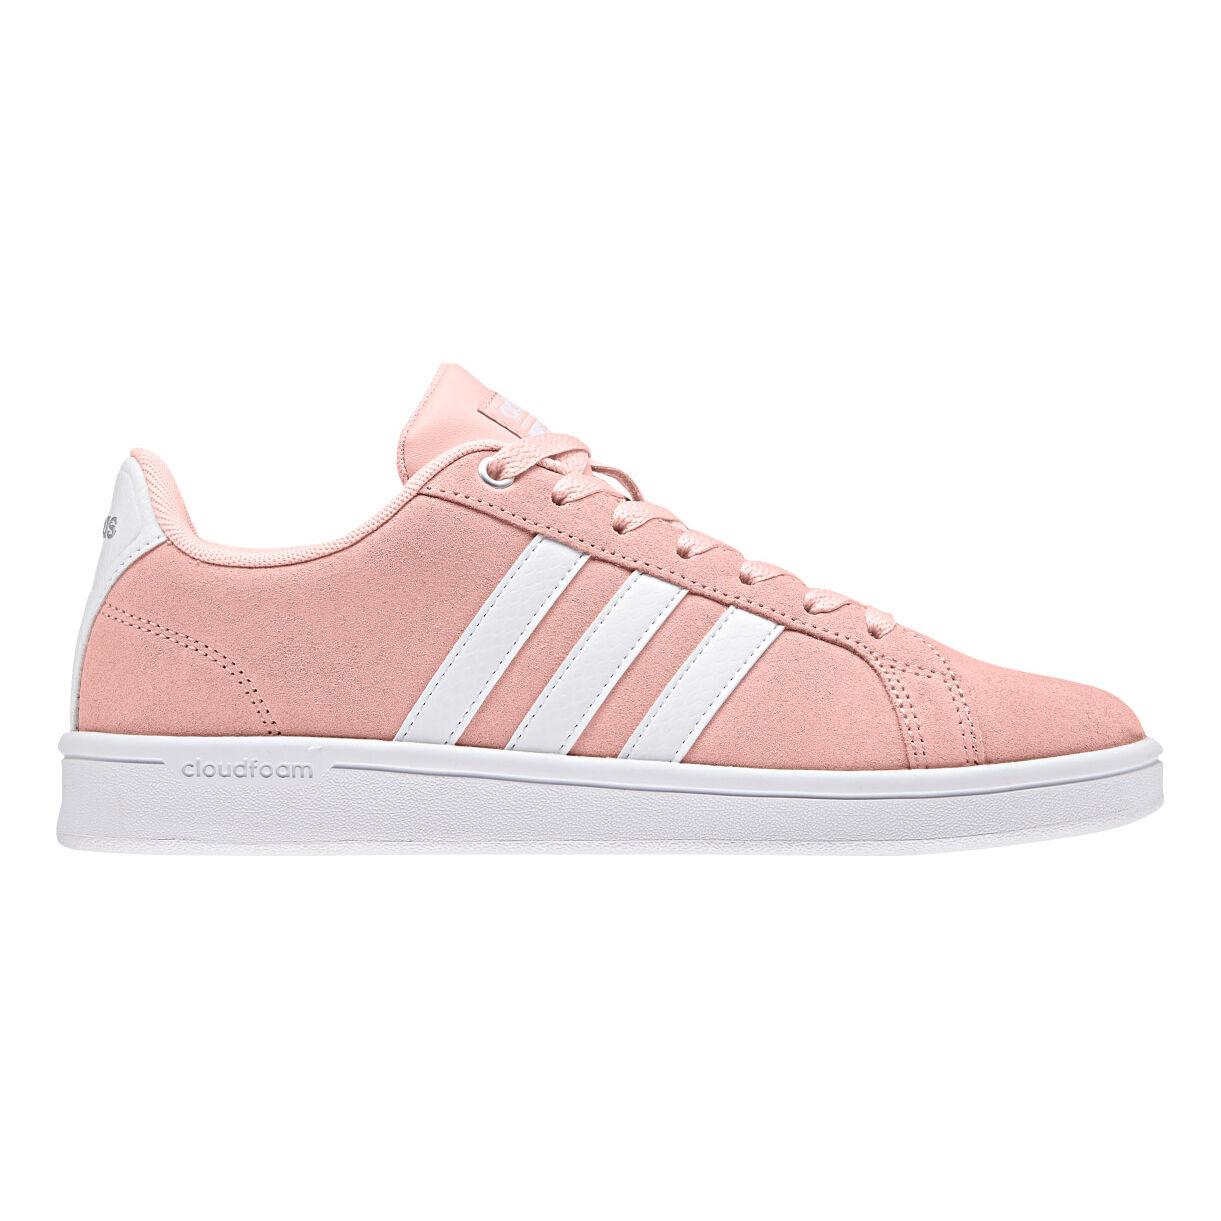 adidas NEO Cloudfoam Advantage Sneaker Damen - Rosa, Weiß ...